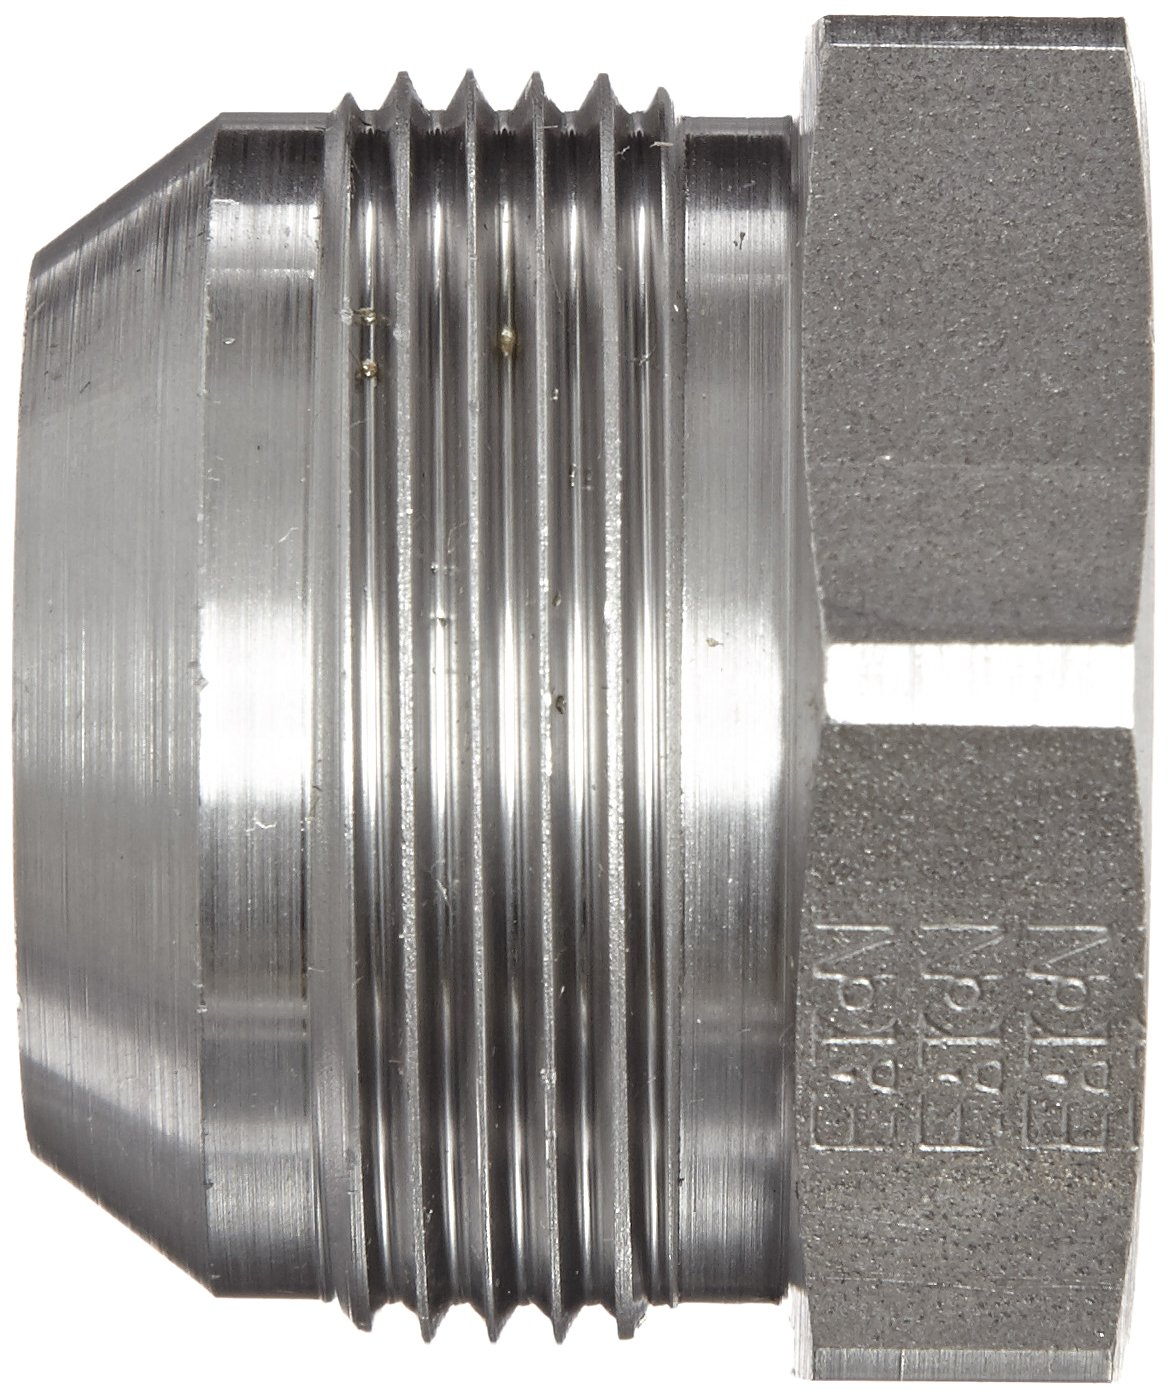 Steel 1//4 JIC x 1//4-Weld-On m JIC 37 Degree /& Weld End Types f End Size Eaton Aeroquip 73014-4S Bore to Male JIC 1//4 Tube OD